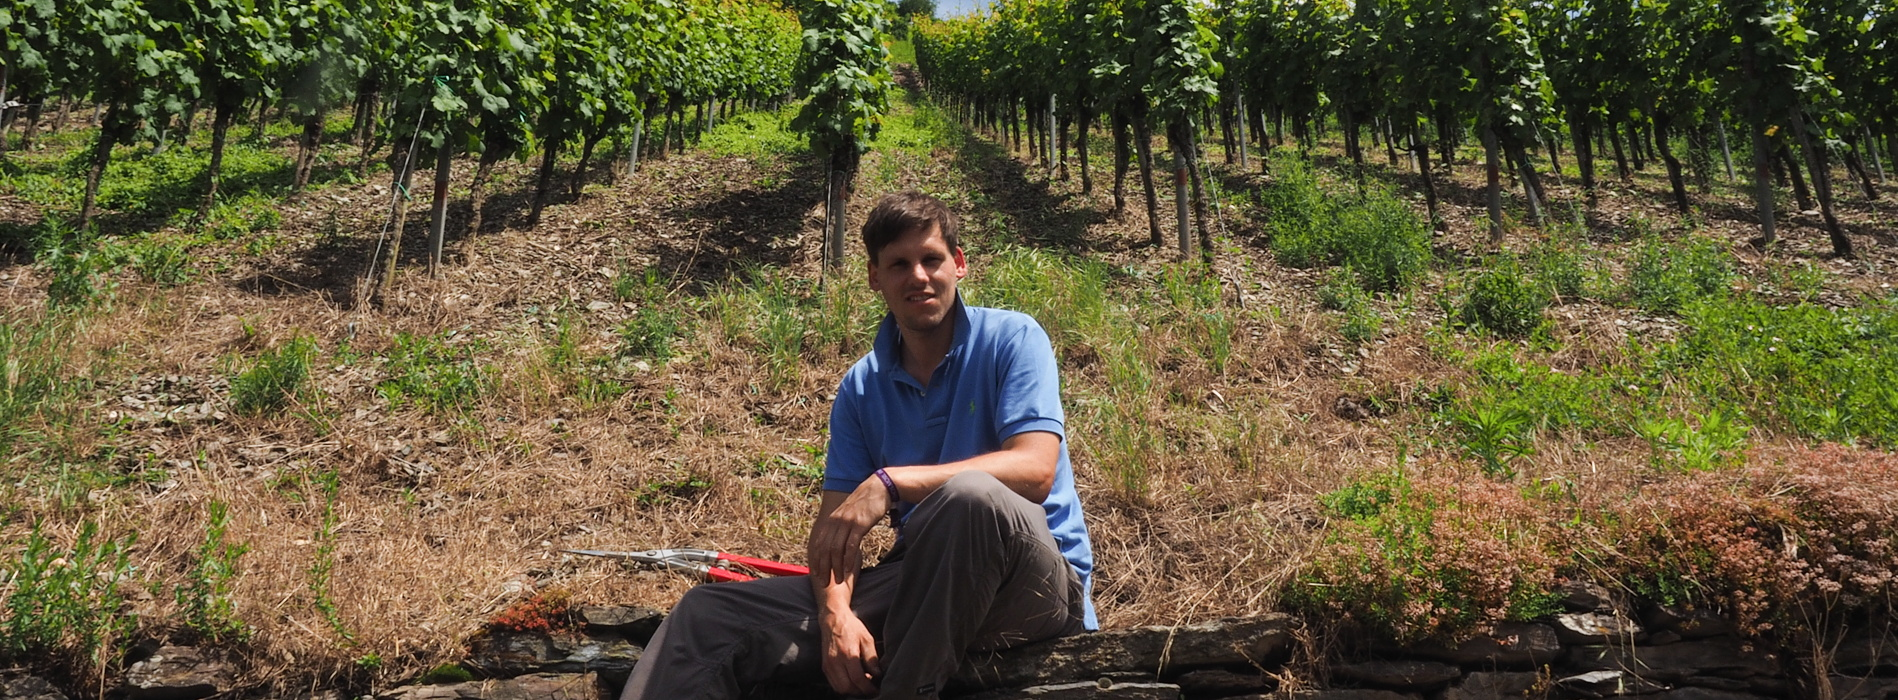 gerrit_walter_walter_winery